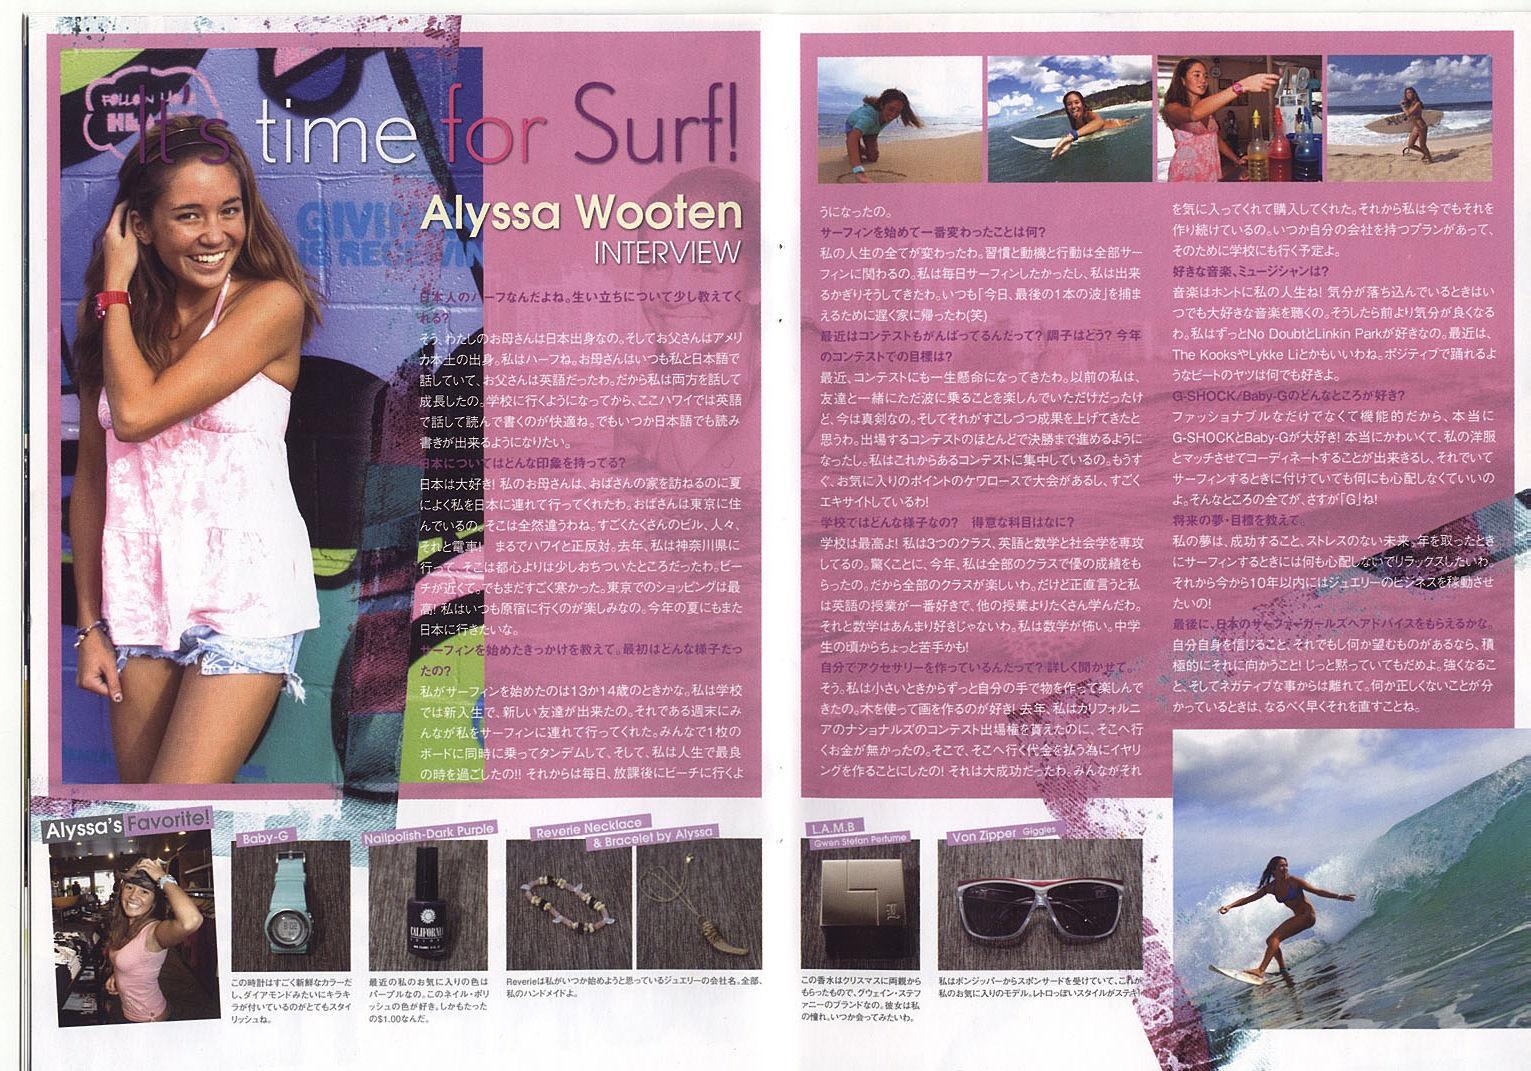 Casio-G-Shock-Surf-Collection-Summer-2009-Page-6.jpg